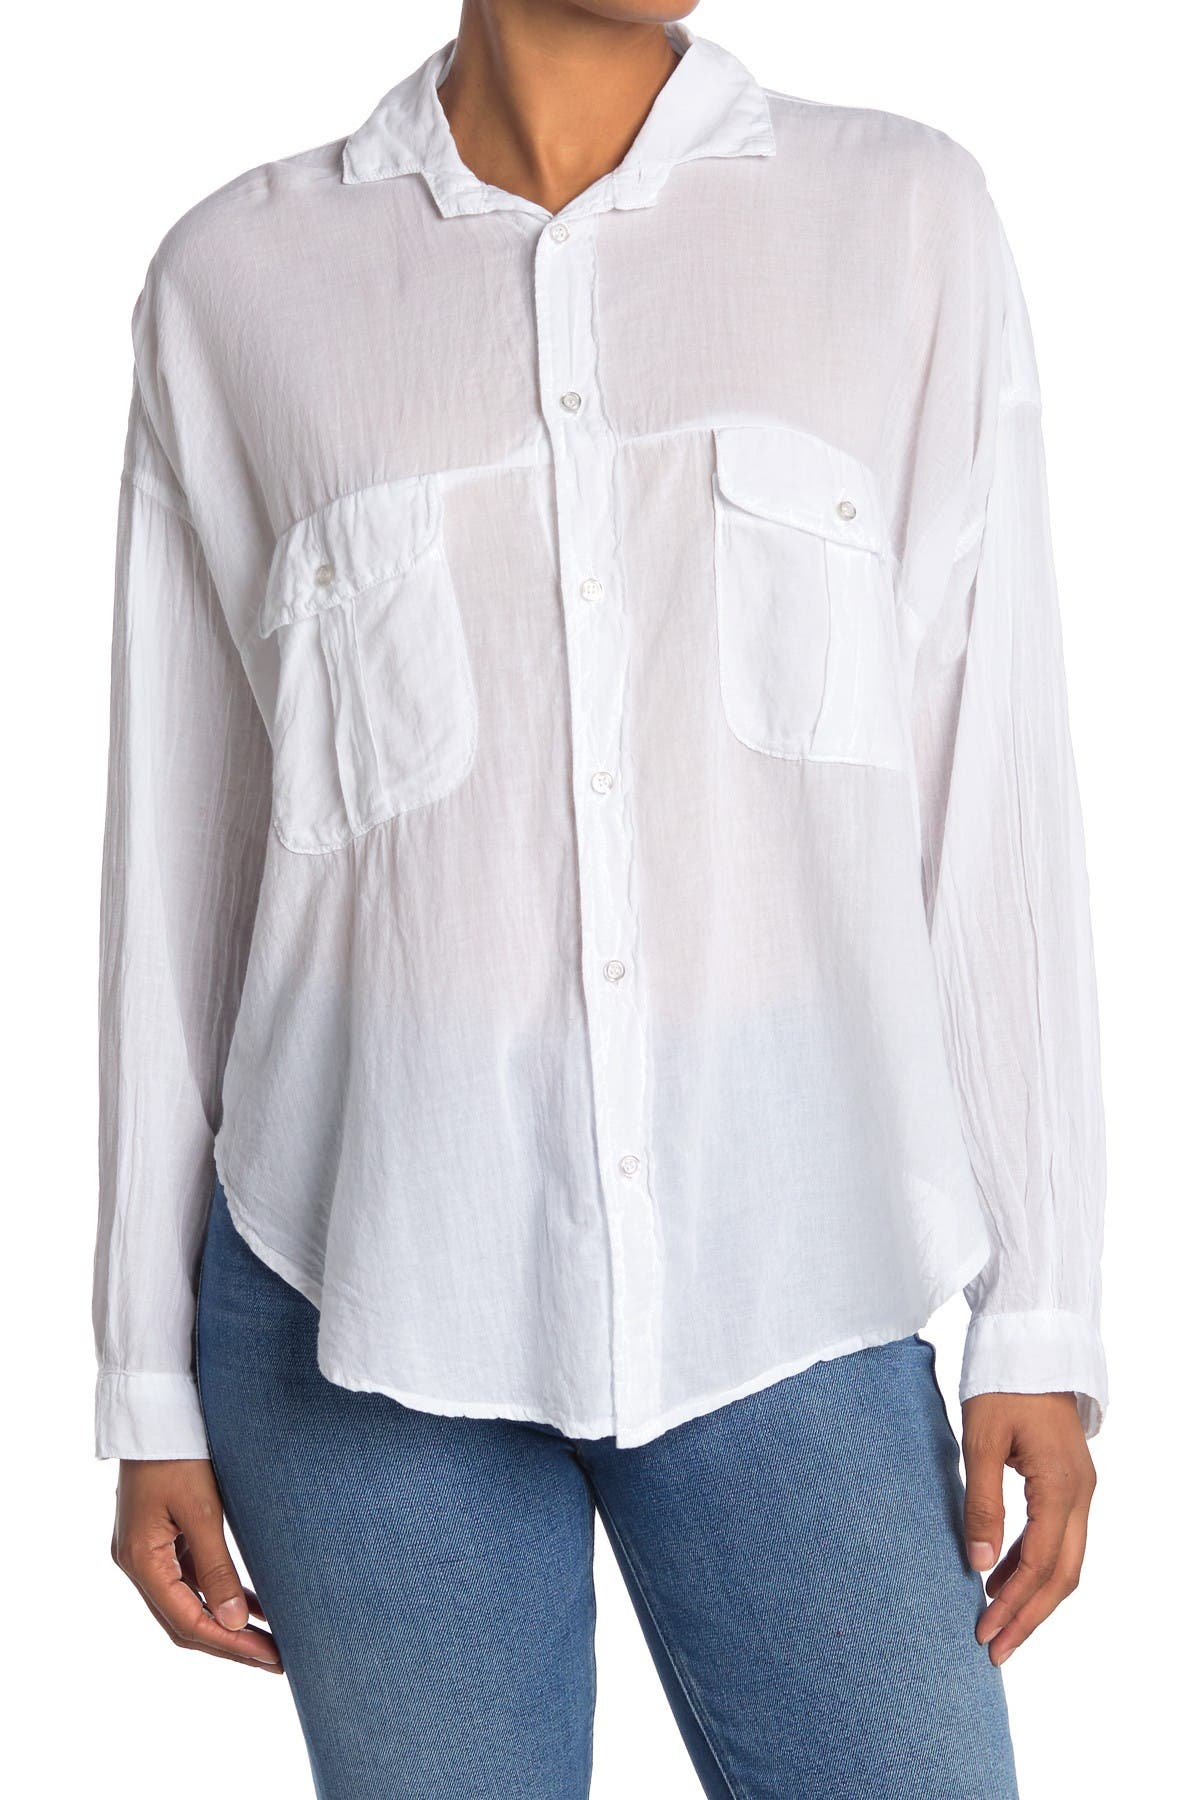 Image of NSF CLOTHING Marci Safari Button Down Shirt